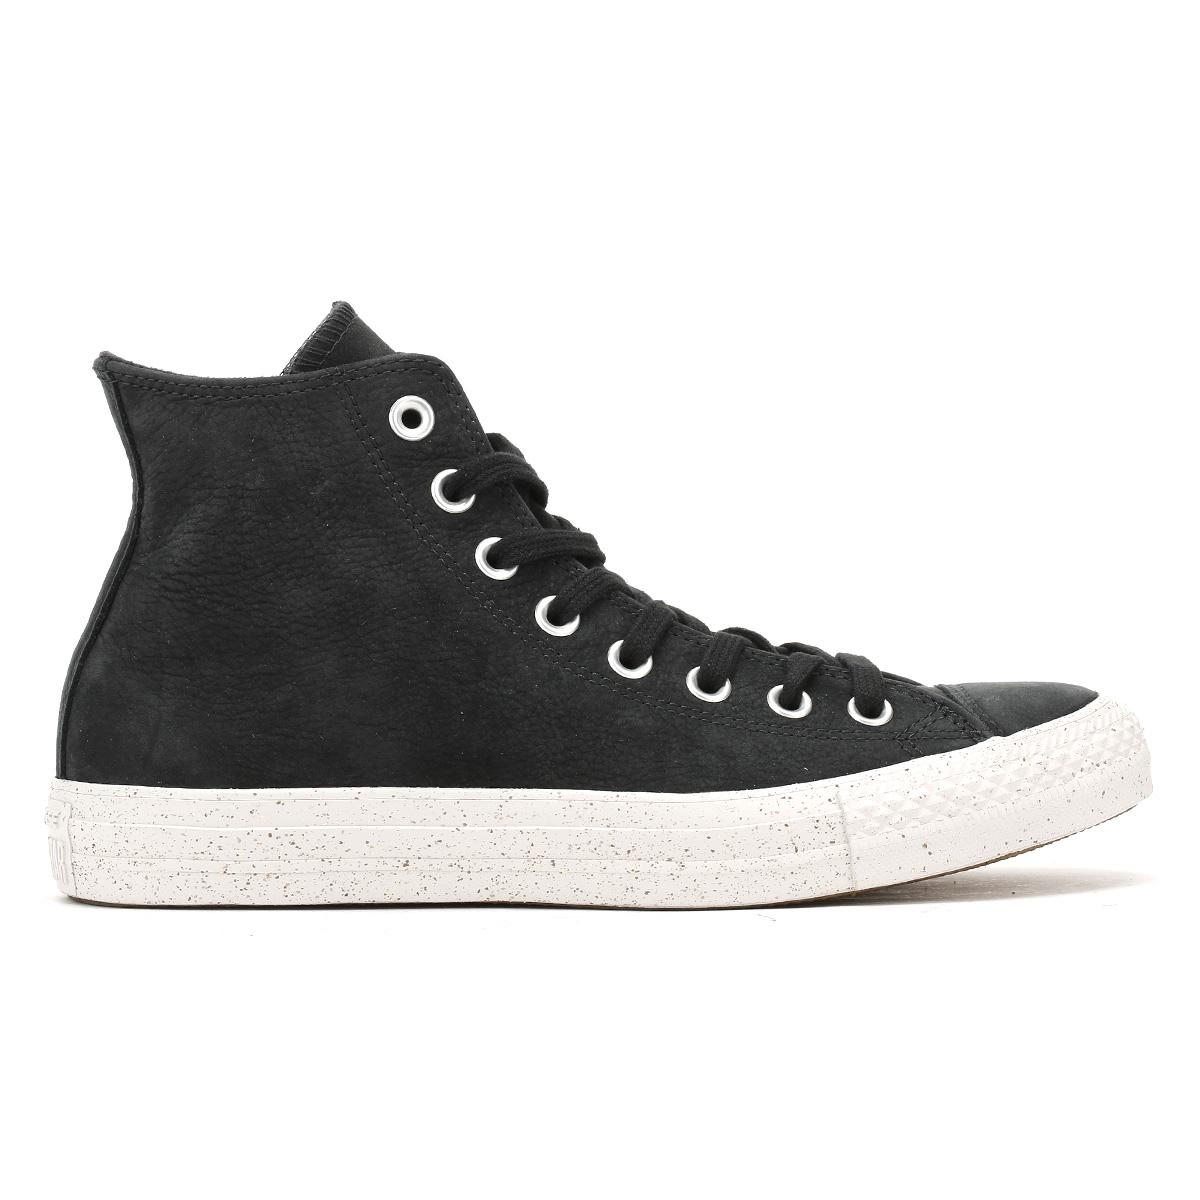 Converse Sneaker Uomo Chuck Taylor Tutti nabuk Star nero pelle nabuk Tutti Hi Tops Scarpe Da Ginnastica Scarpe 01c58f